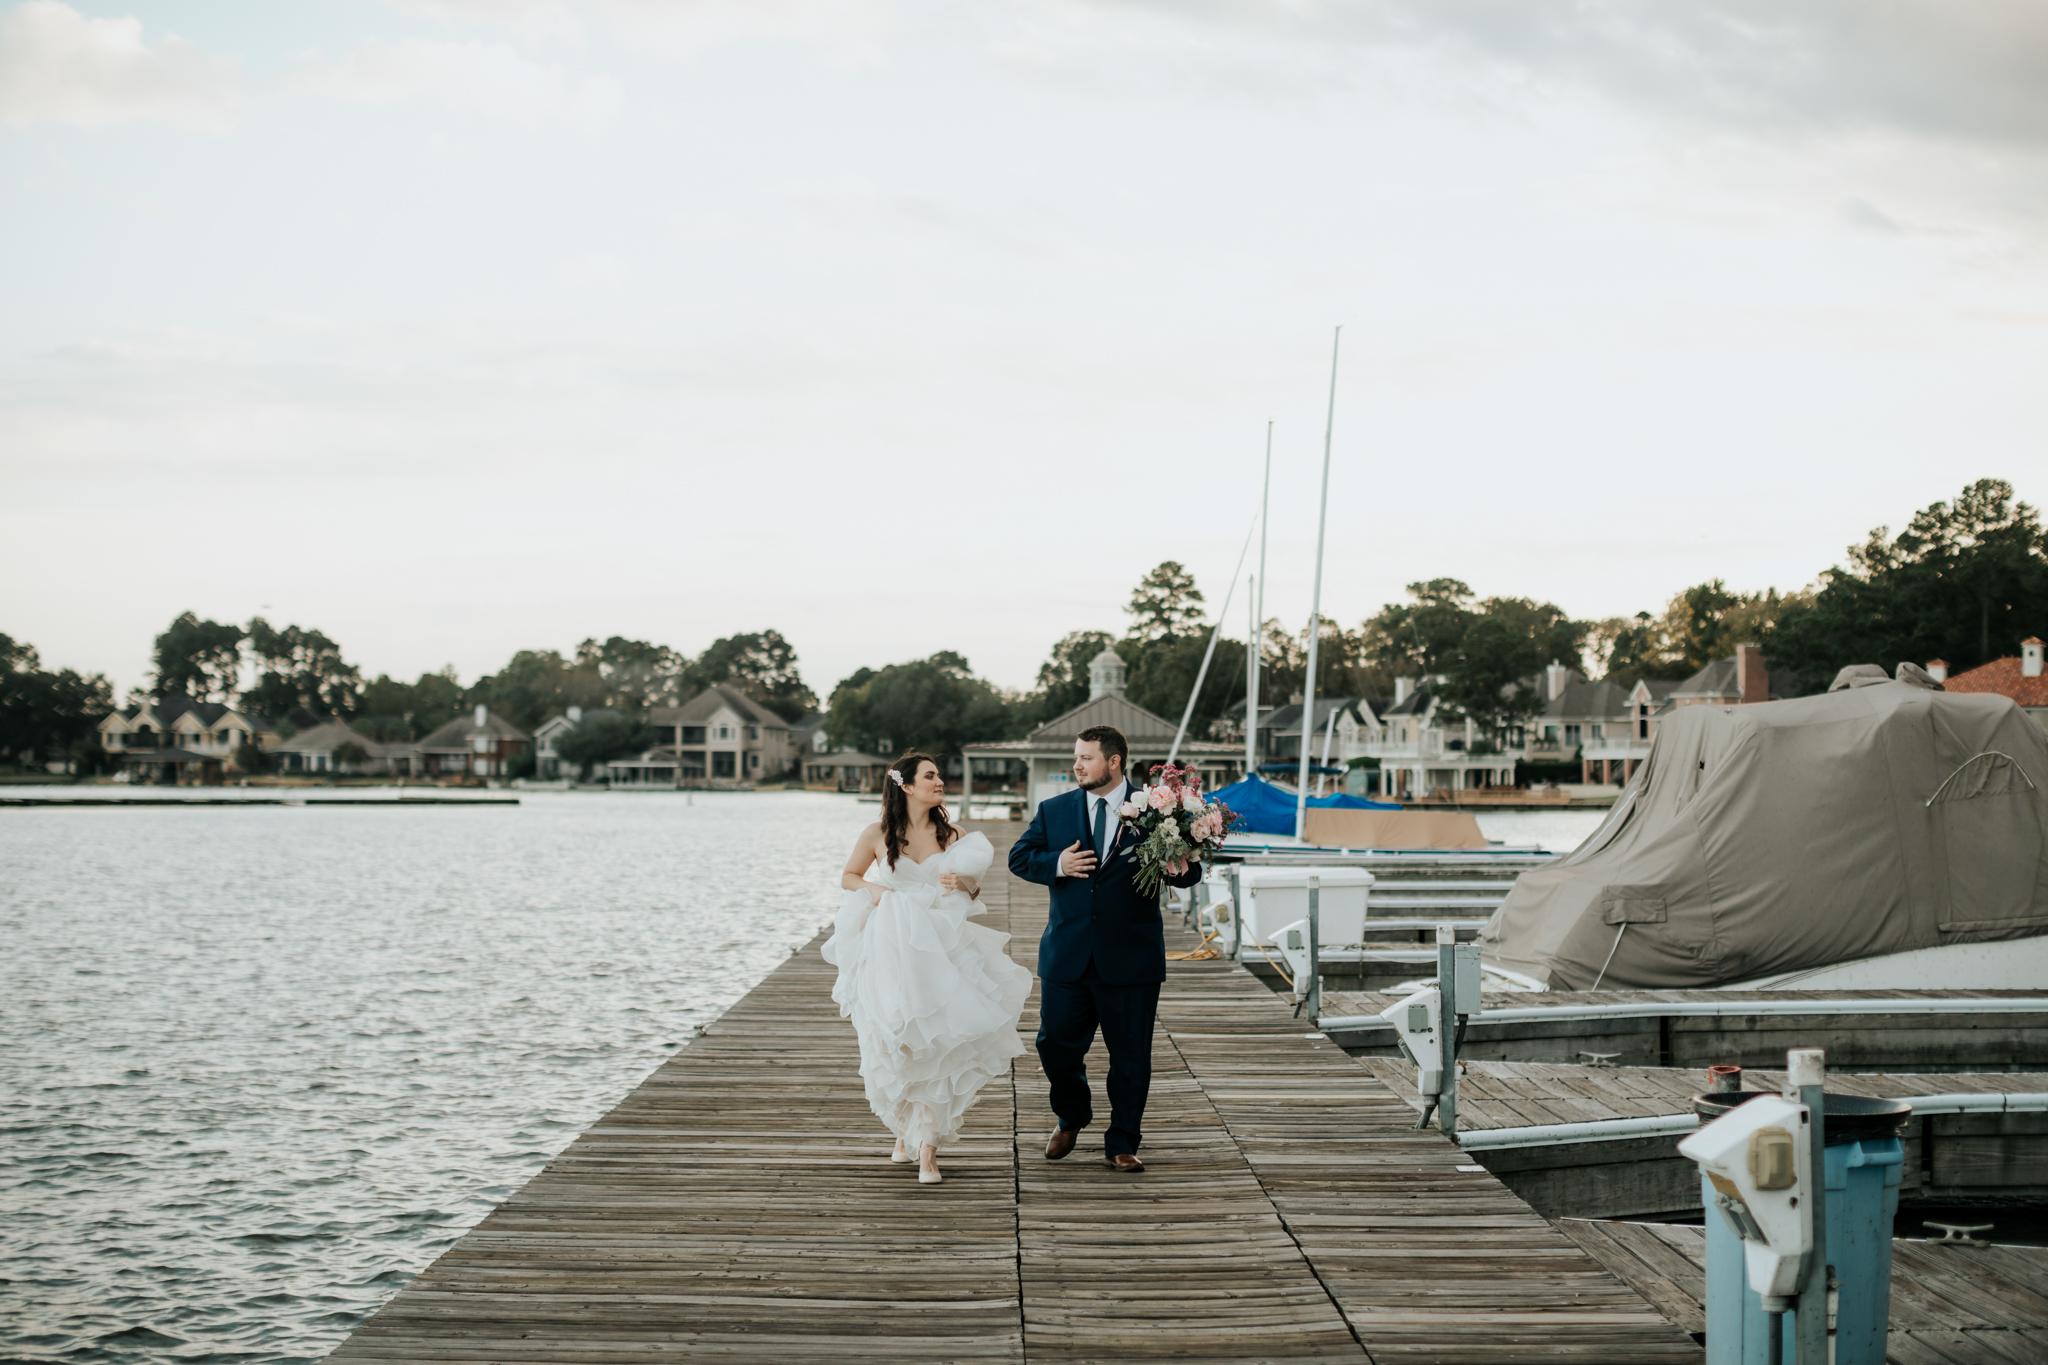 Leah Nicole Photography - Houston Wedding Photographer-Lake Conroe Wedding- Houston Wedding Photographer-42.jpg